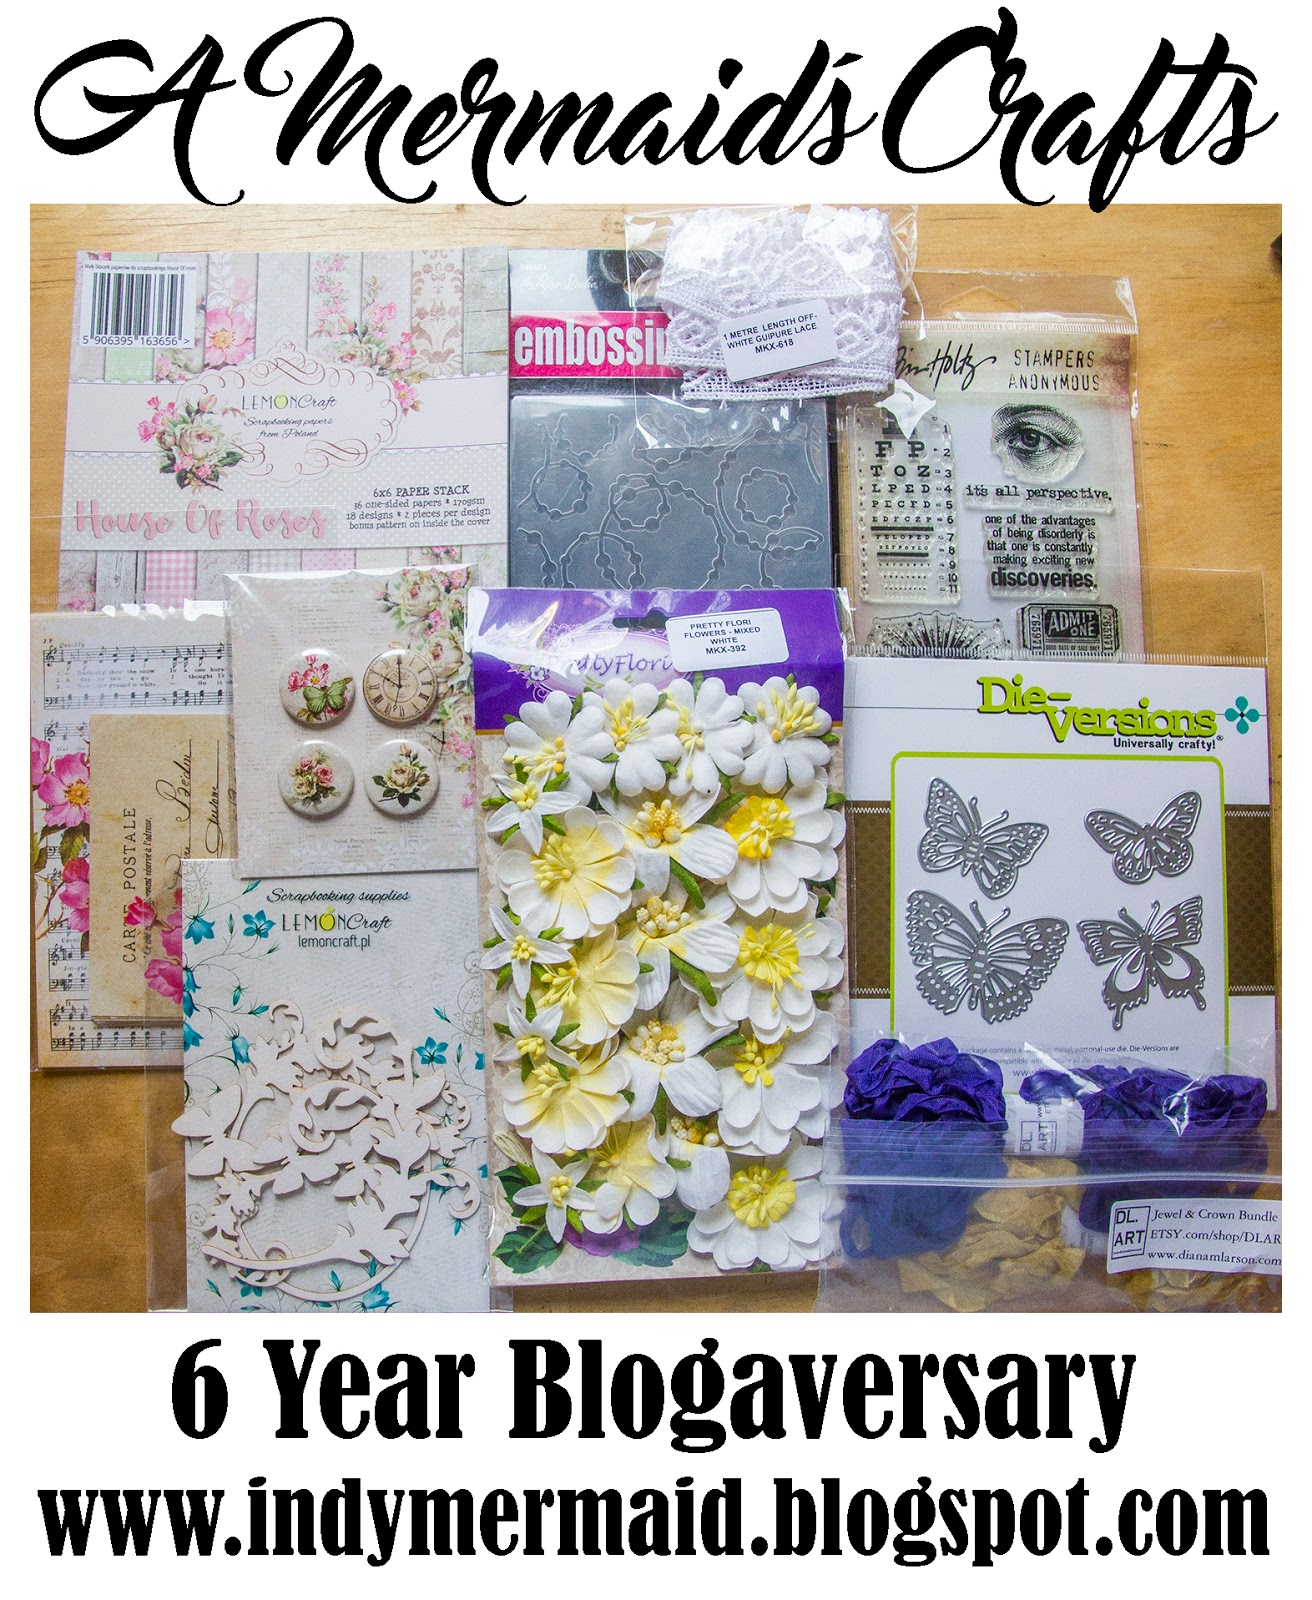 Lisa's Blogaversary Giveaway!